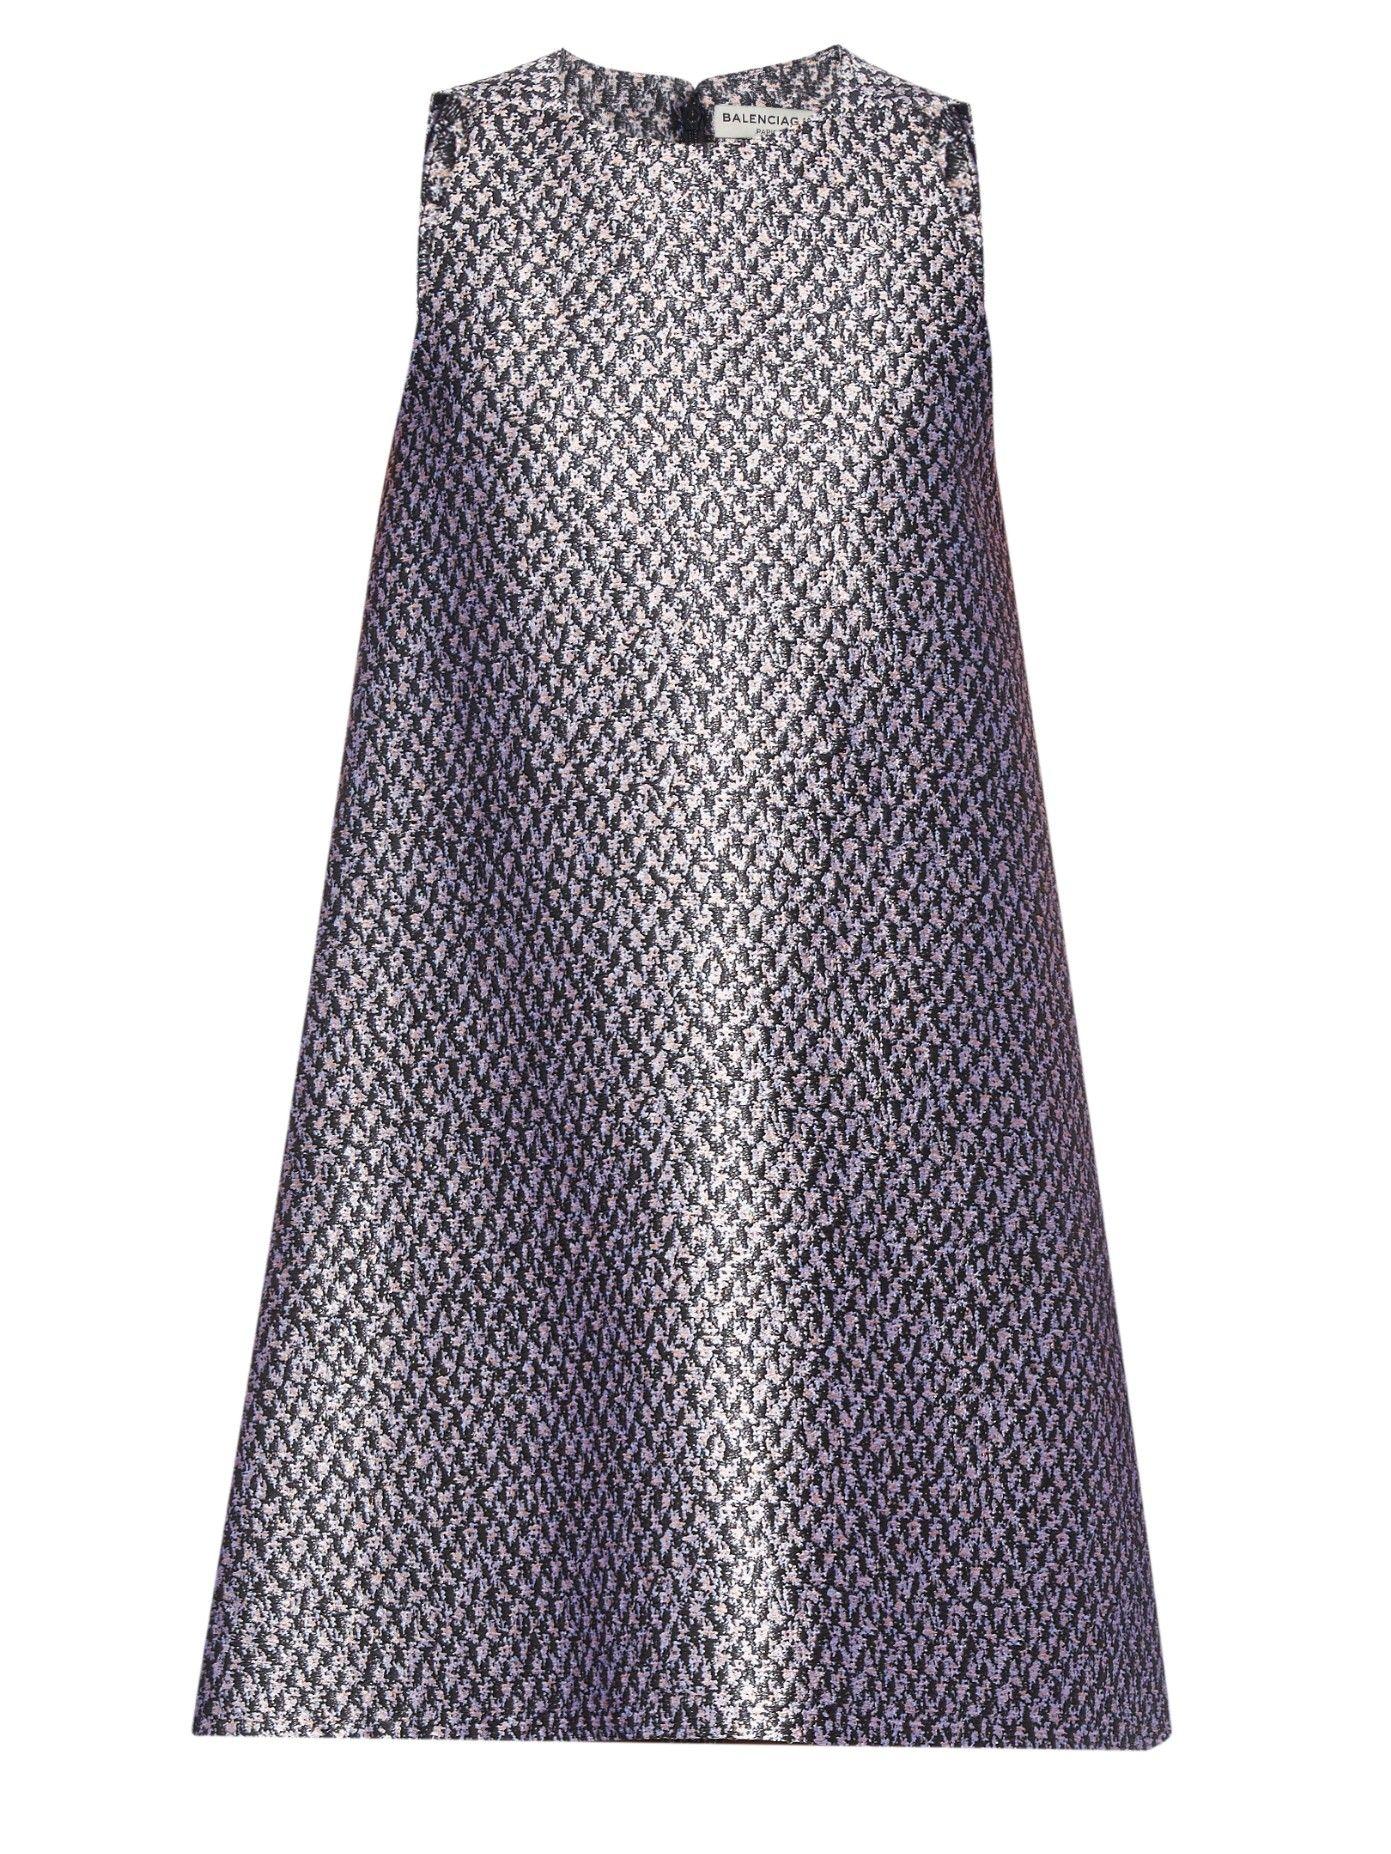 Tweed-jacquard sleeveless dress   Balenciaga   MATCHESFASHION.COM US